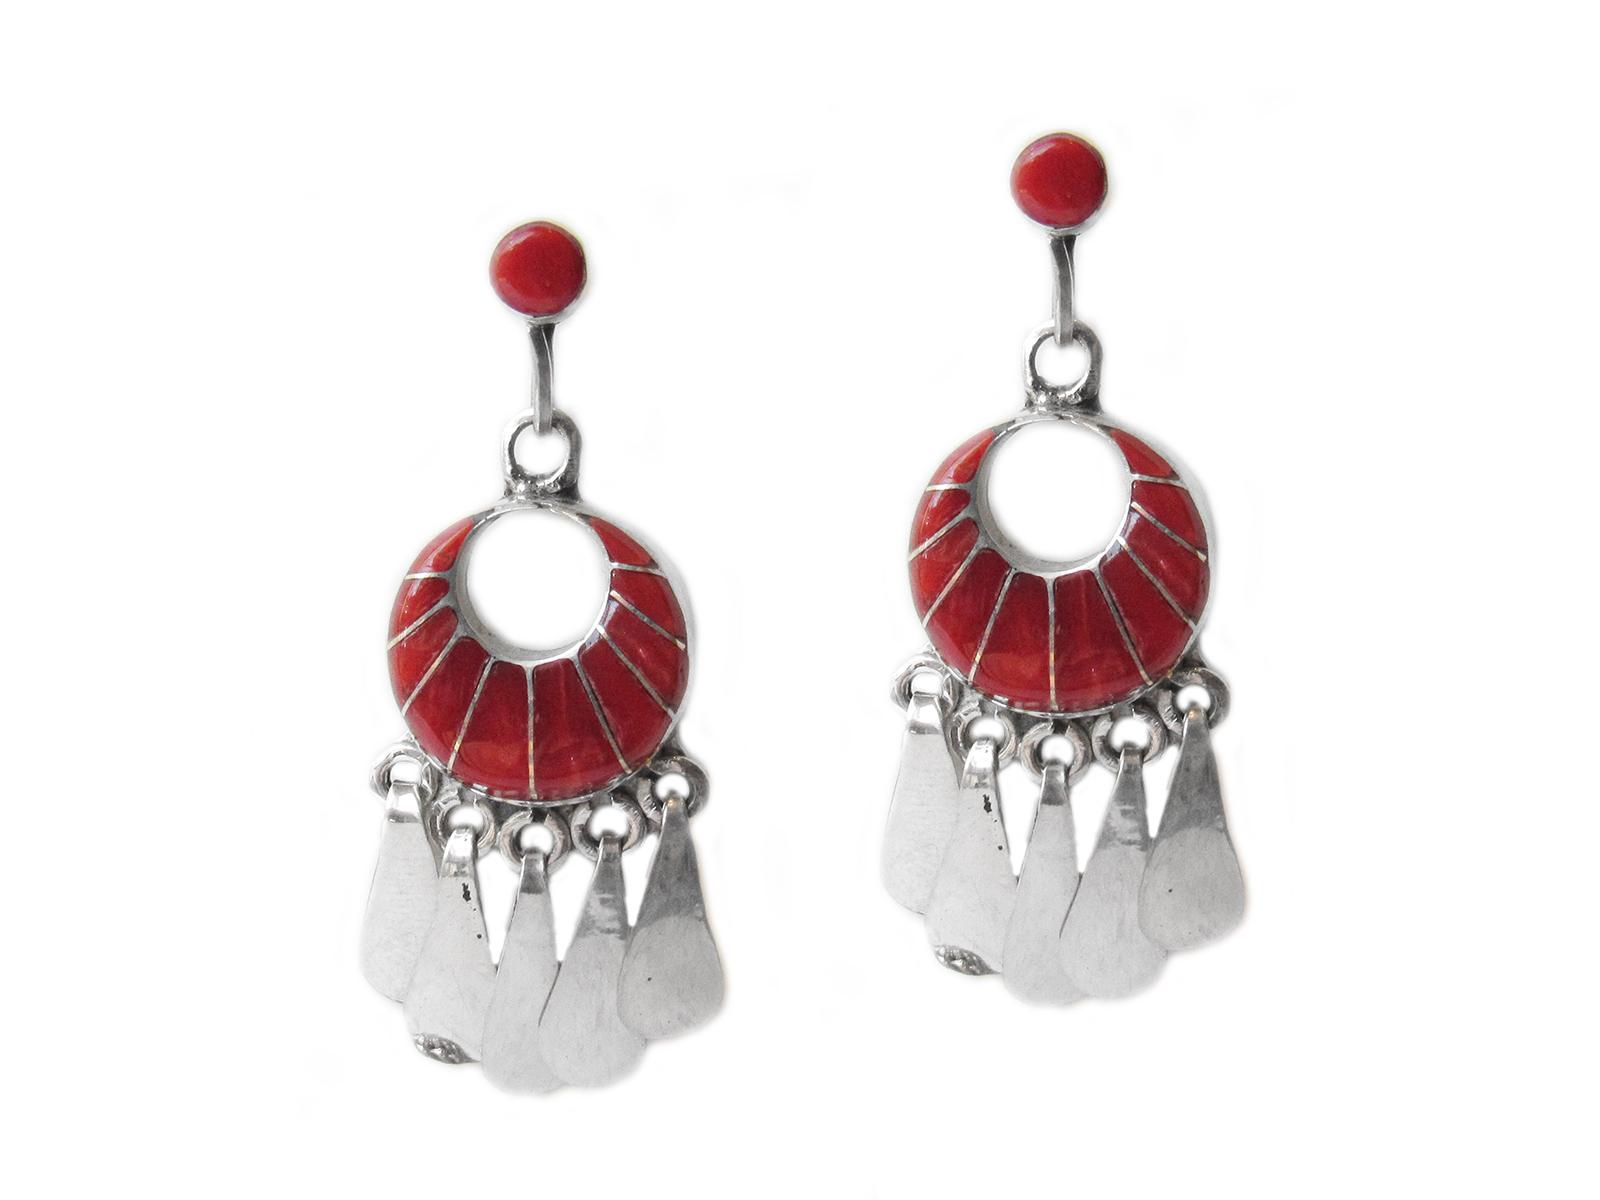 Coral Inlay Earrings